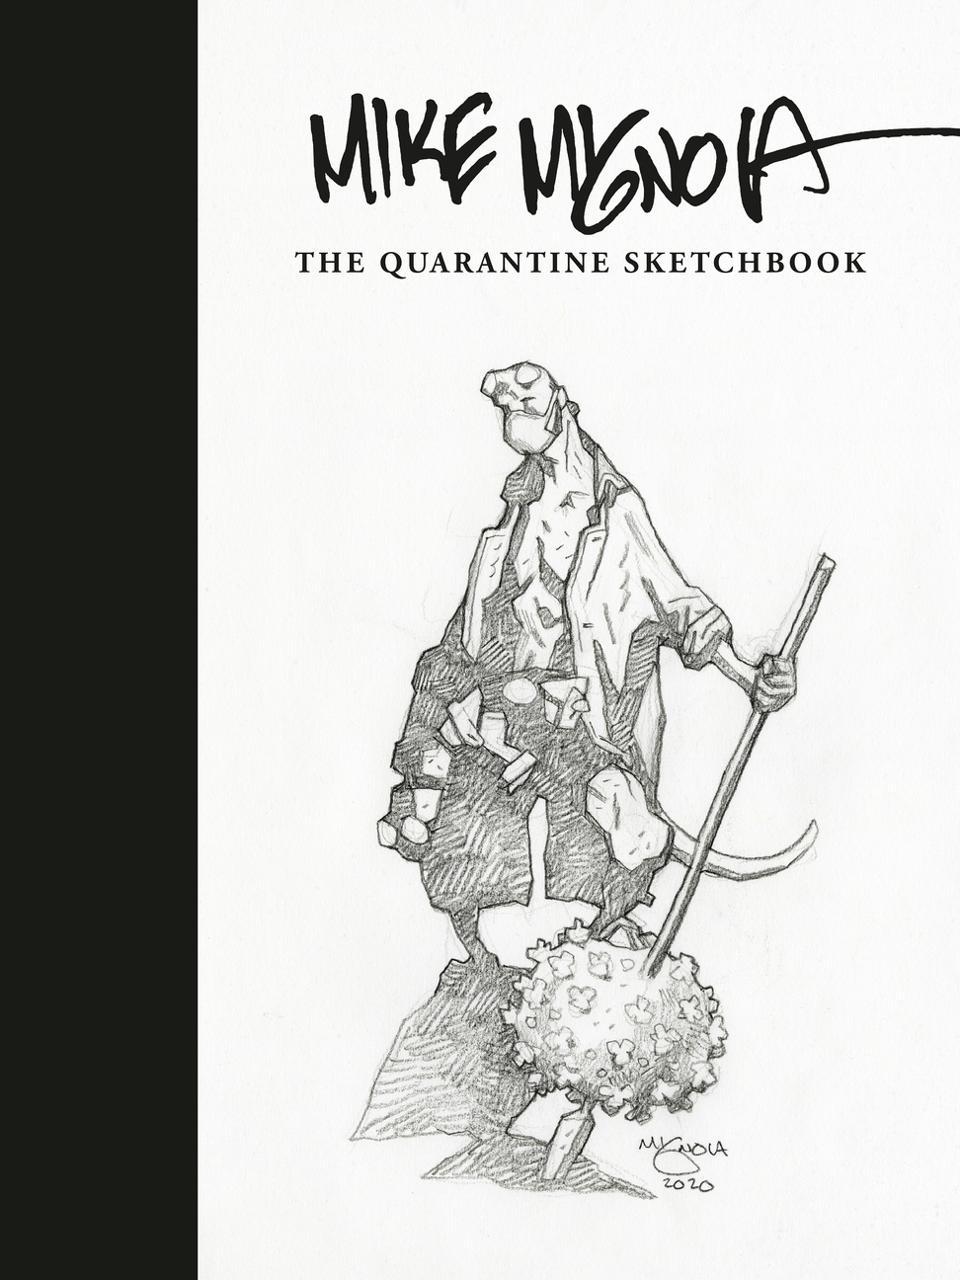 ″Mike Mignola: The Quarantine Sketchbook″ cover